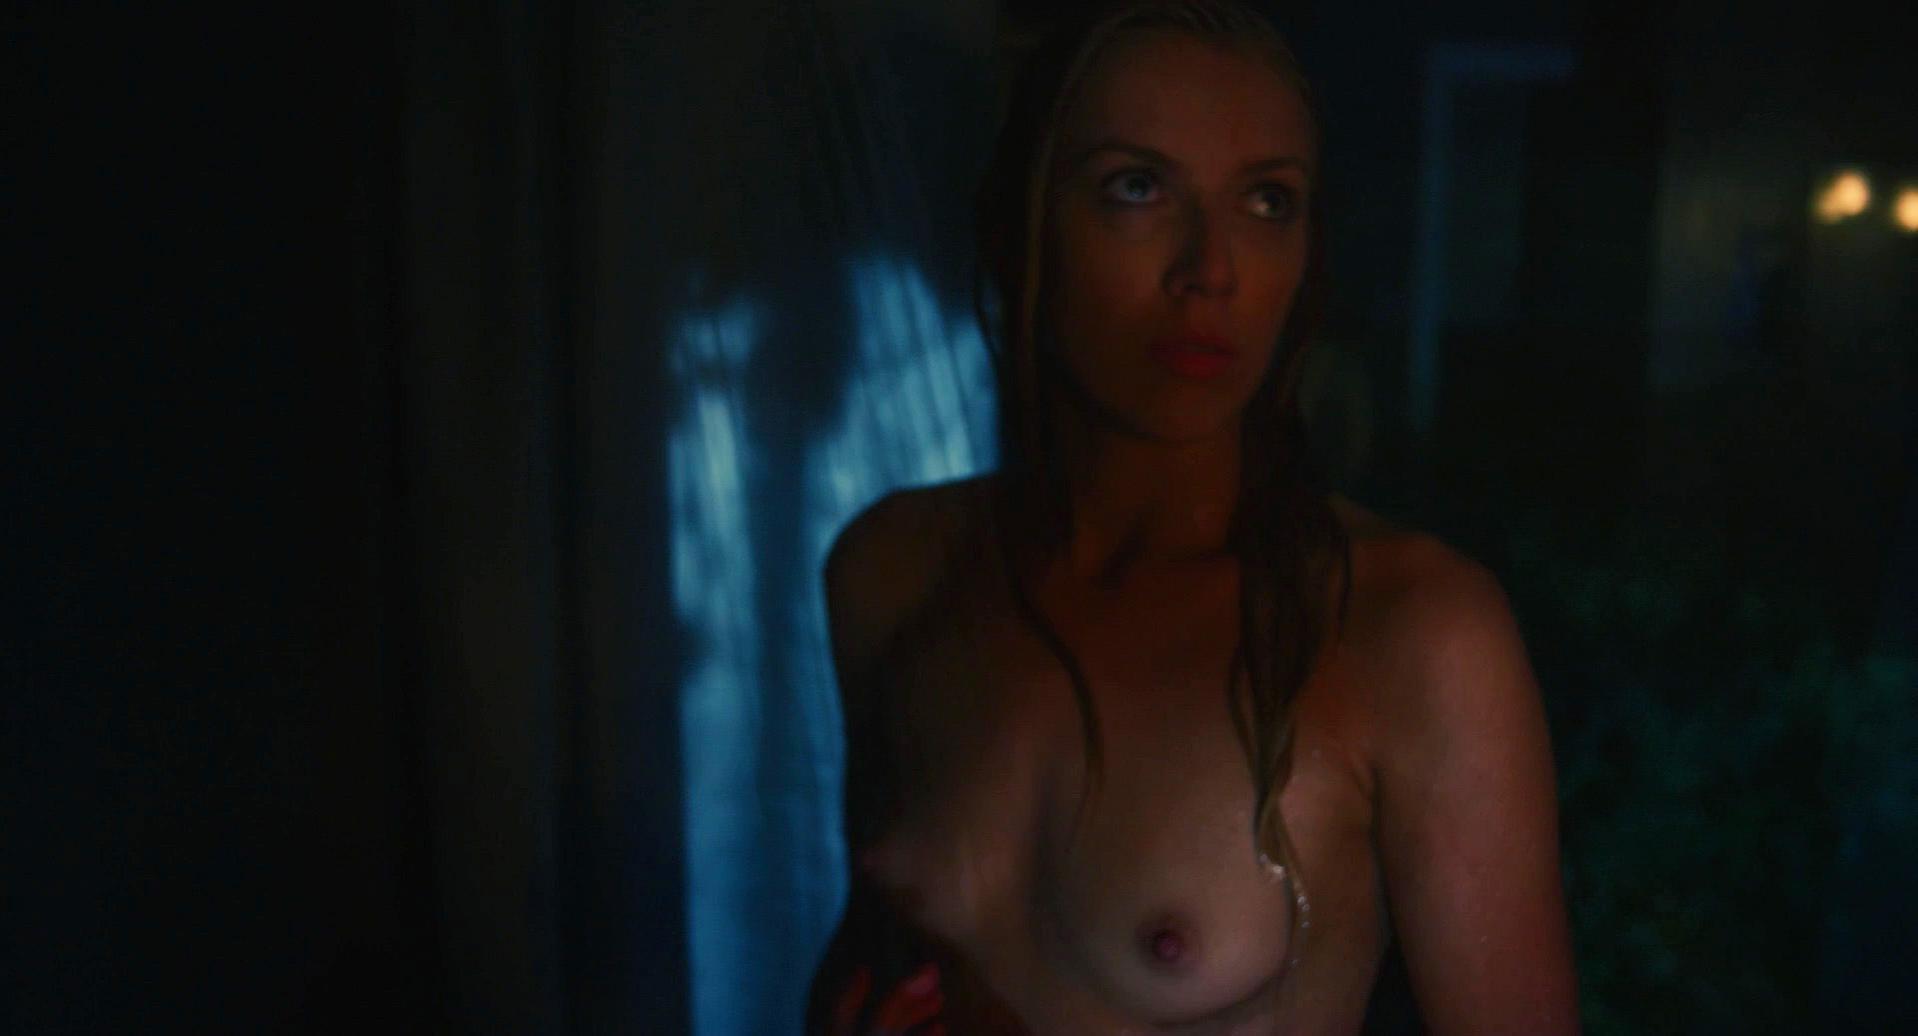 Laura Jacobs nude - Muck (2015)